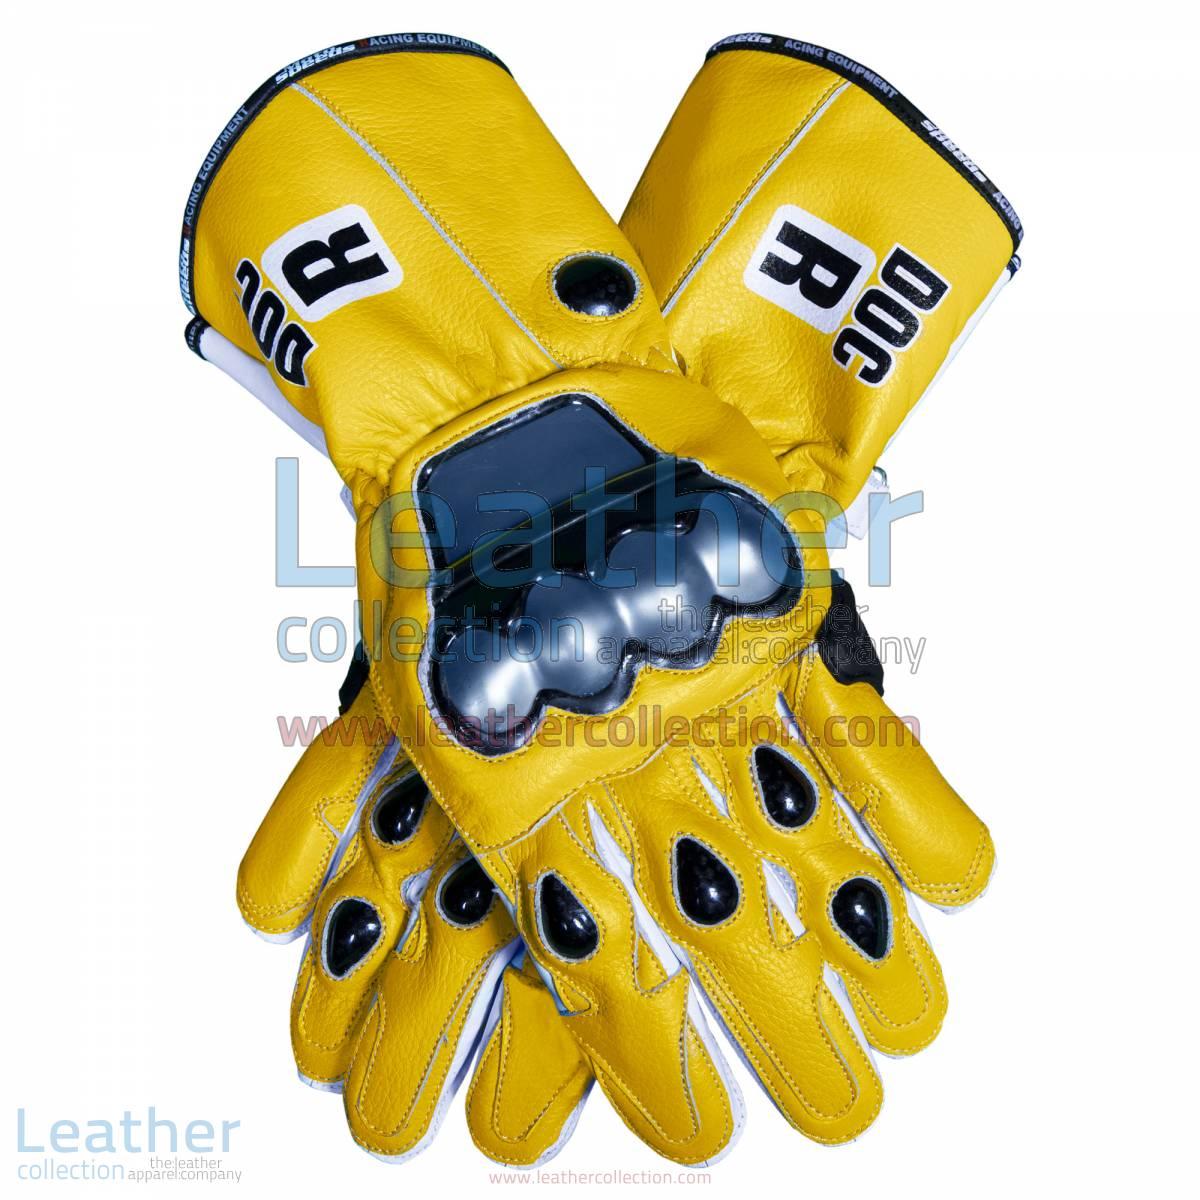 Valentino Rossi Yamaha MotoGP 2006 Racing Gloves   Valentino Rossi Yamaha MotoGP 2006 Racing Gloves